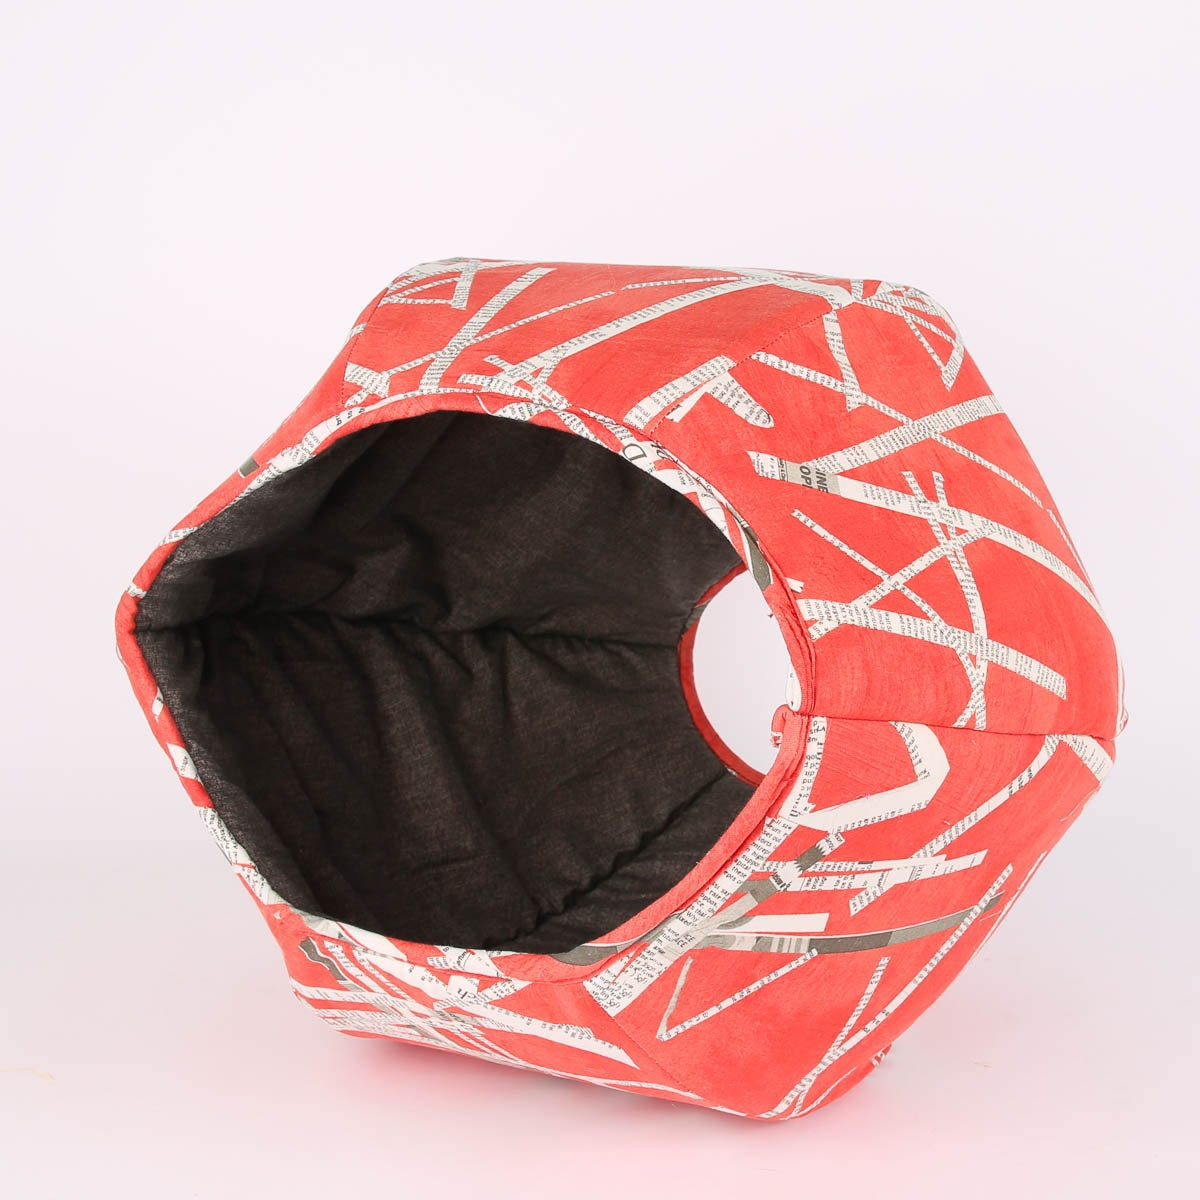 umb stoff katze bett in tomate rot katze ball. Black Bedroom Furniture Sets. Home Design Ideas